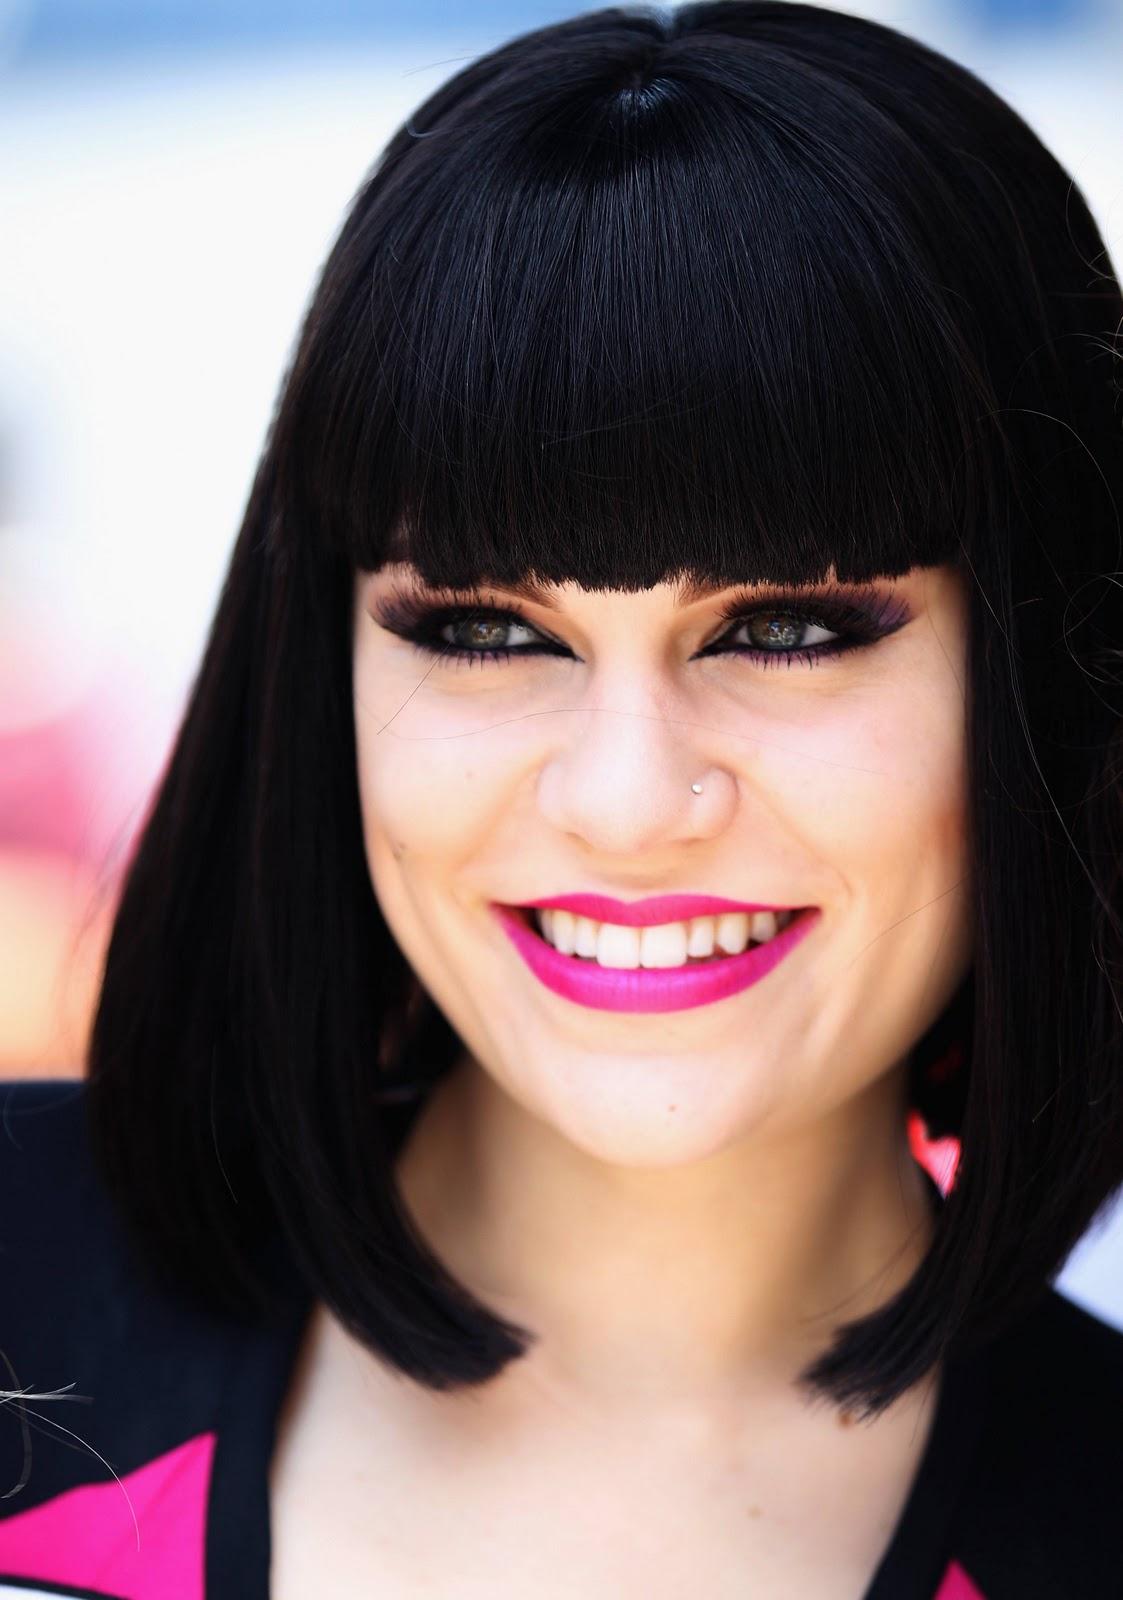 Jessie J - Picture Colection